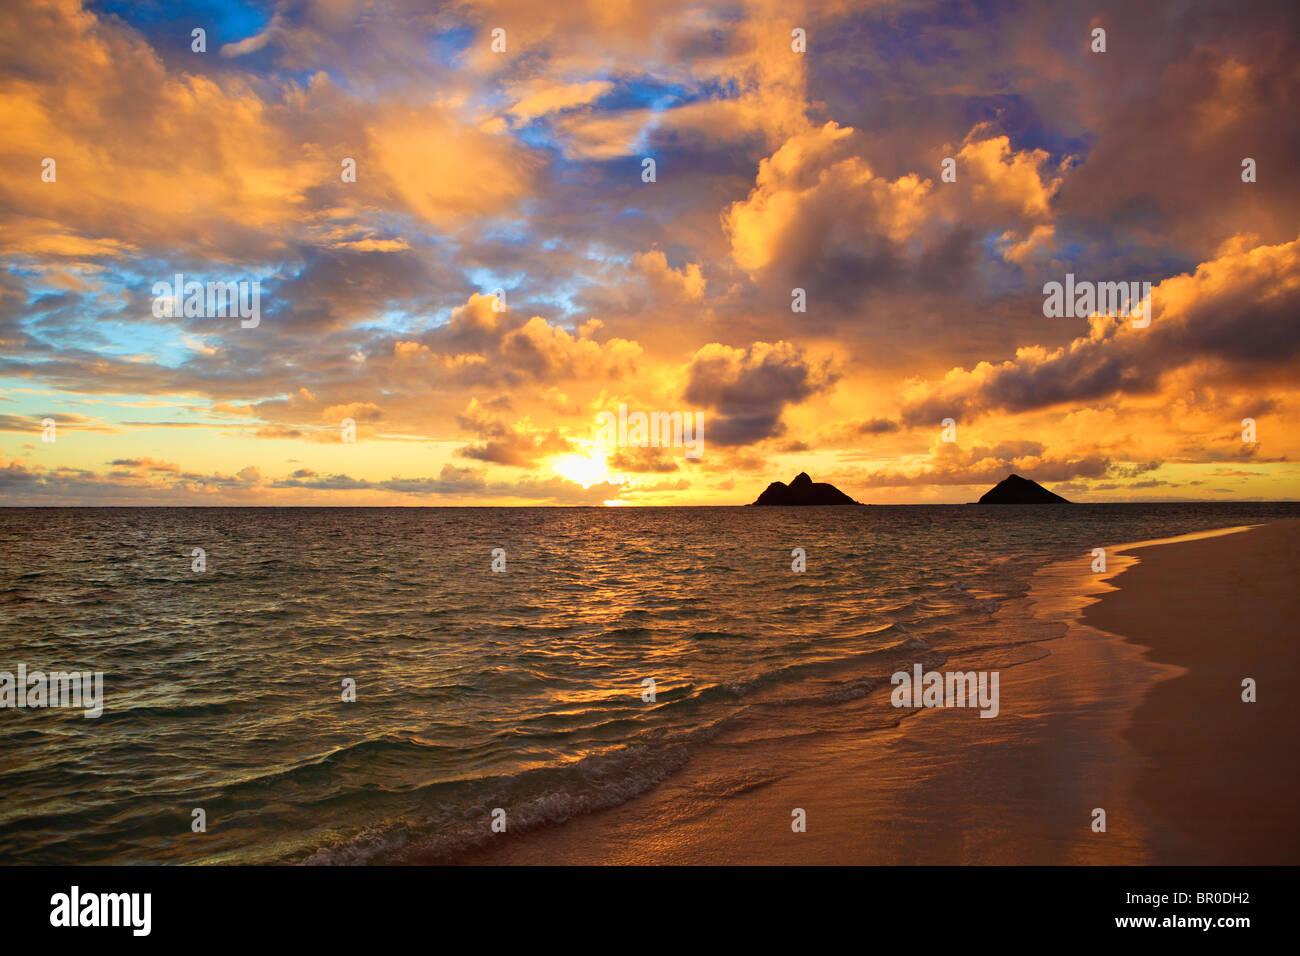 September sunrise over the Mokulua Islands at Lanikai, Hawaii - Stock Image